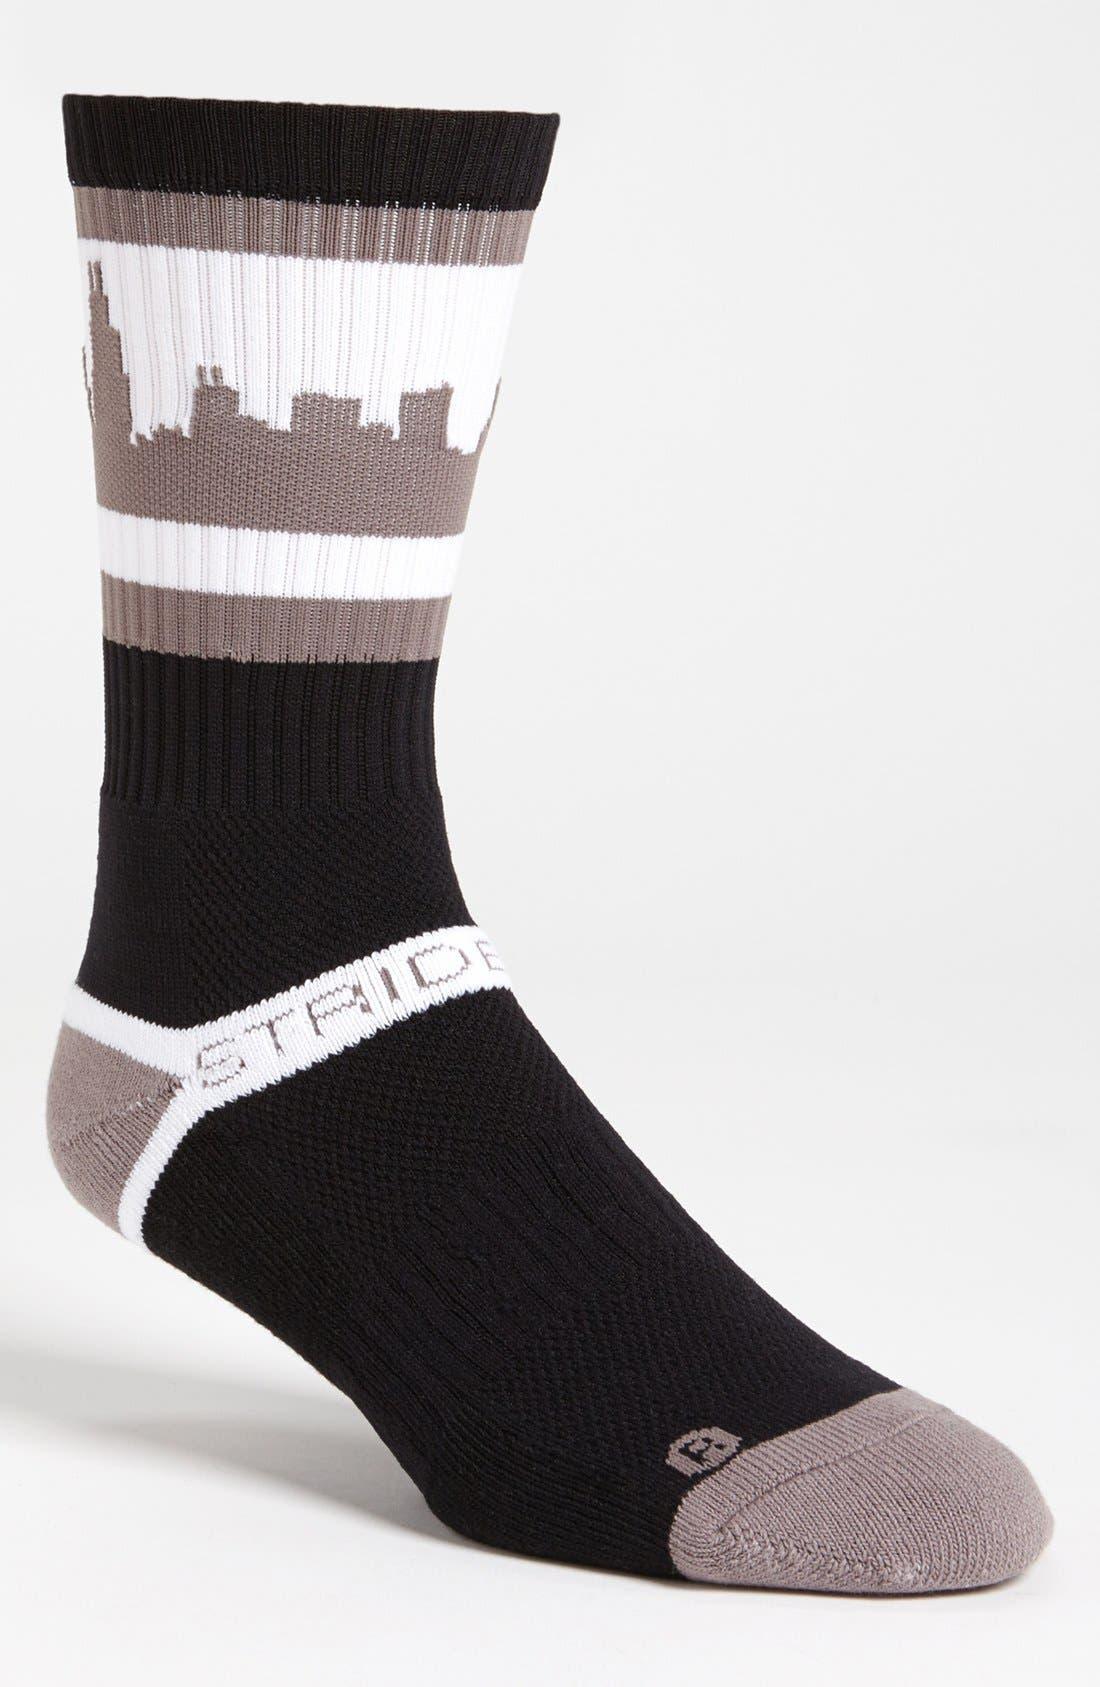 Alternate Image 1 Selected - STRIDELINE 'Chicago' Socks